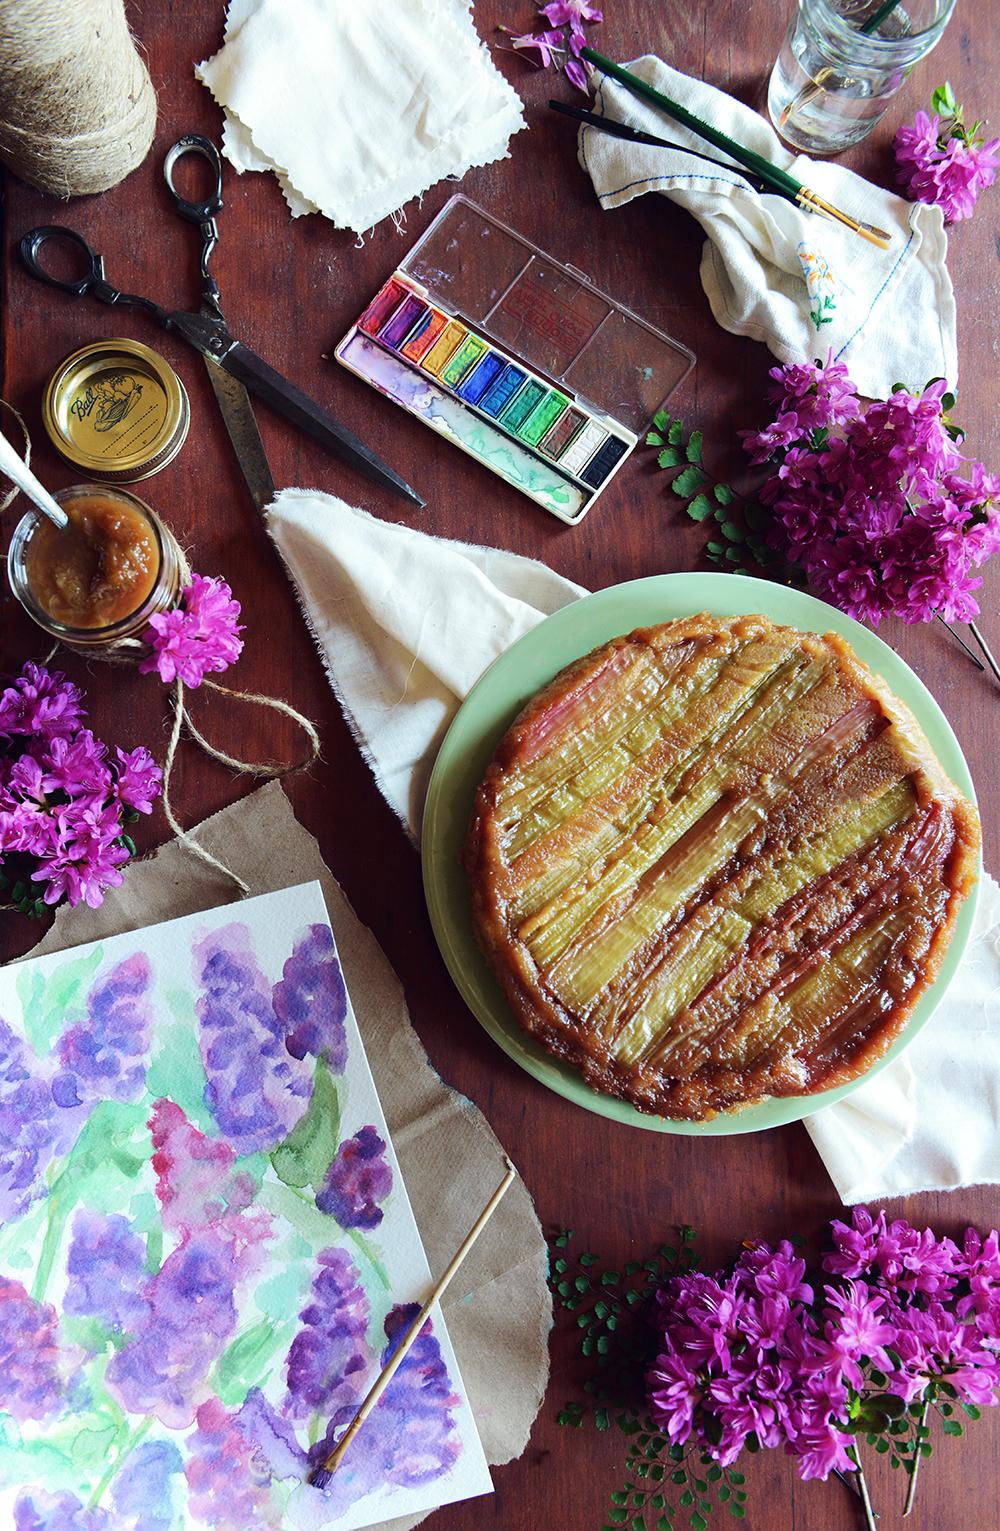 Whole Wheat Rhubarb Upside Down Cake and Rhubarb Compote // www.WithTheGrains.com